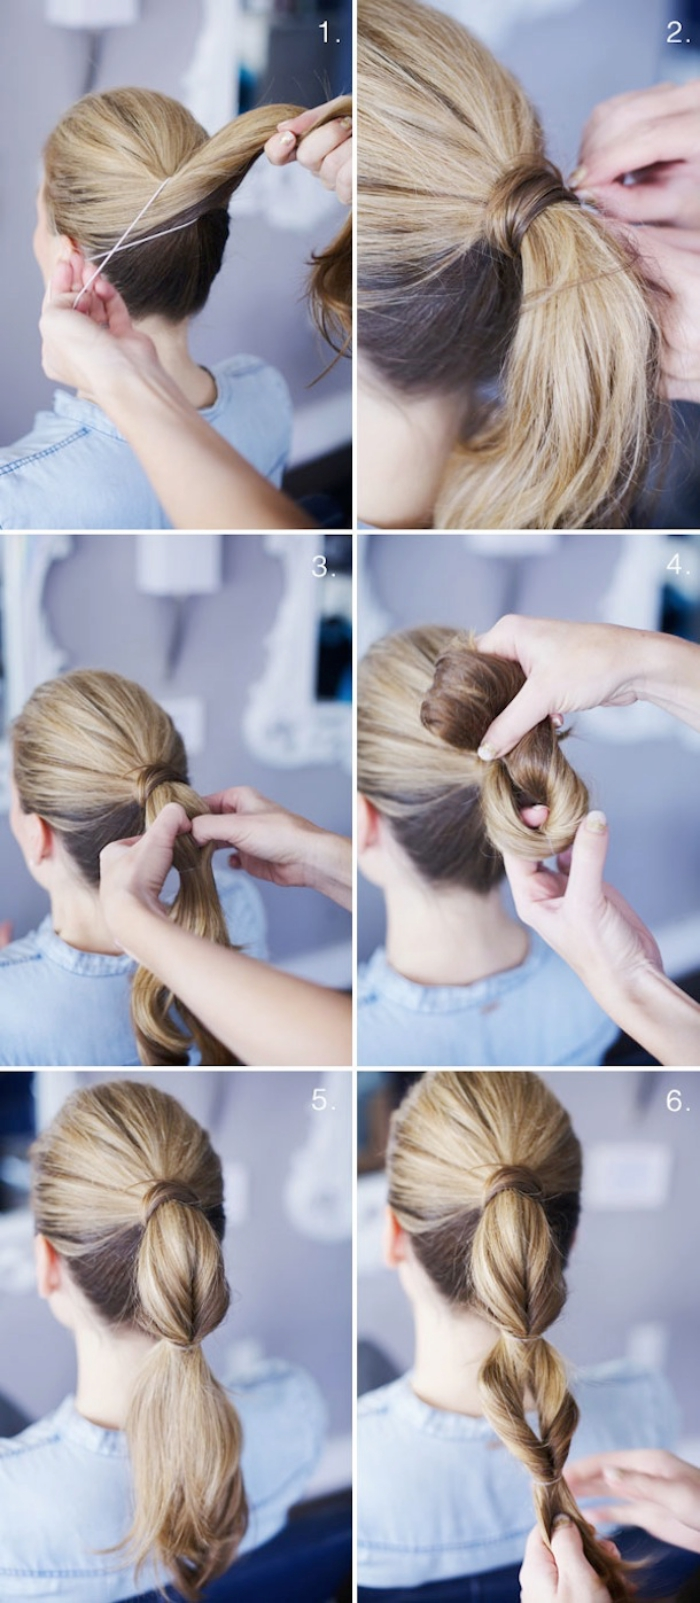 schnelle flechtfrisuren ideen, frsiuren lange haare, einfache flechtsmethode, haarfrisuren anleitung